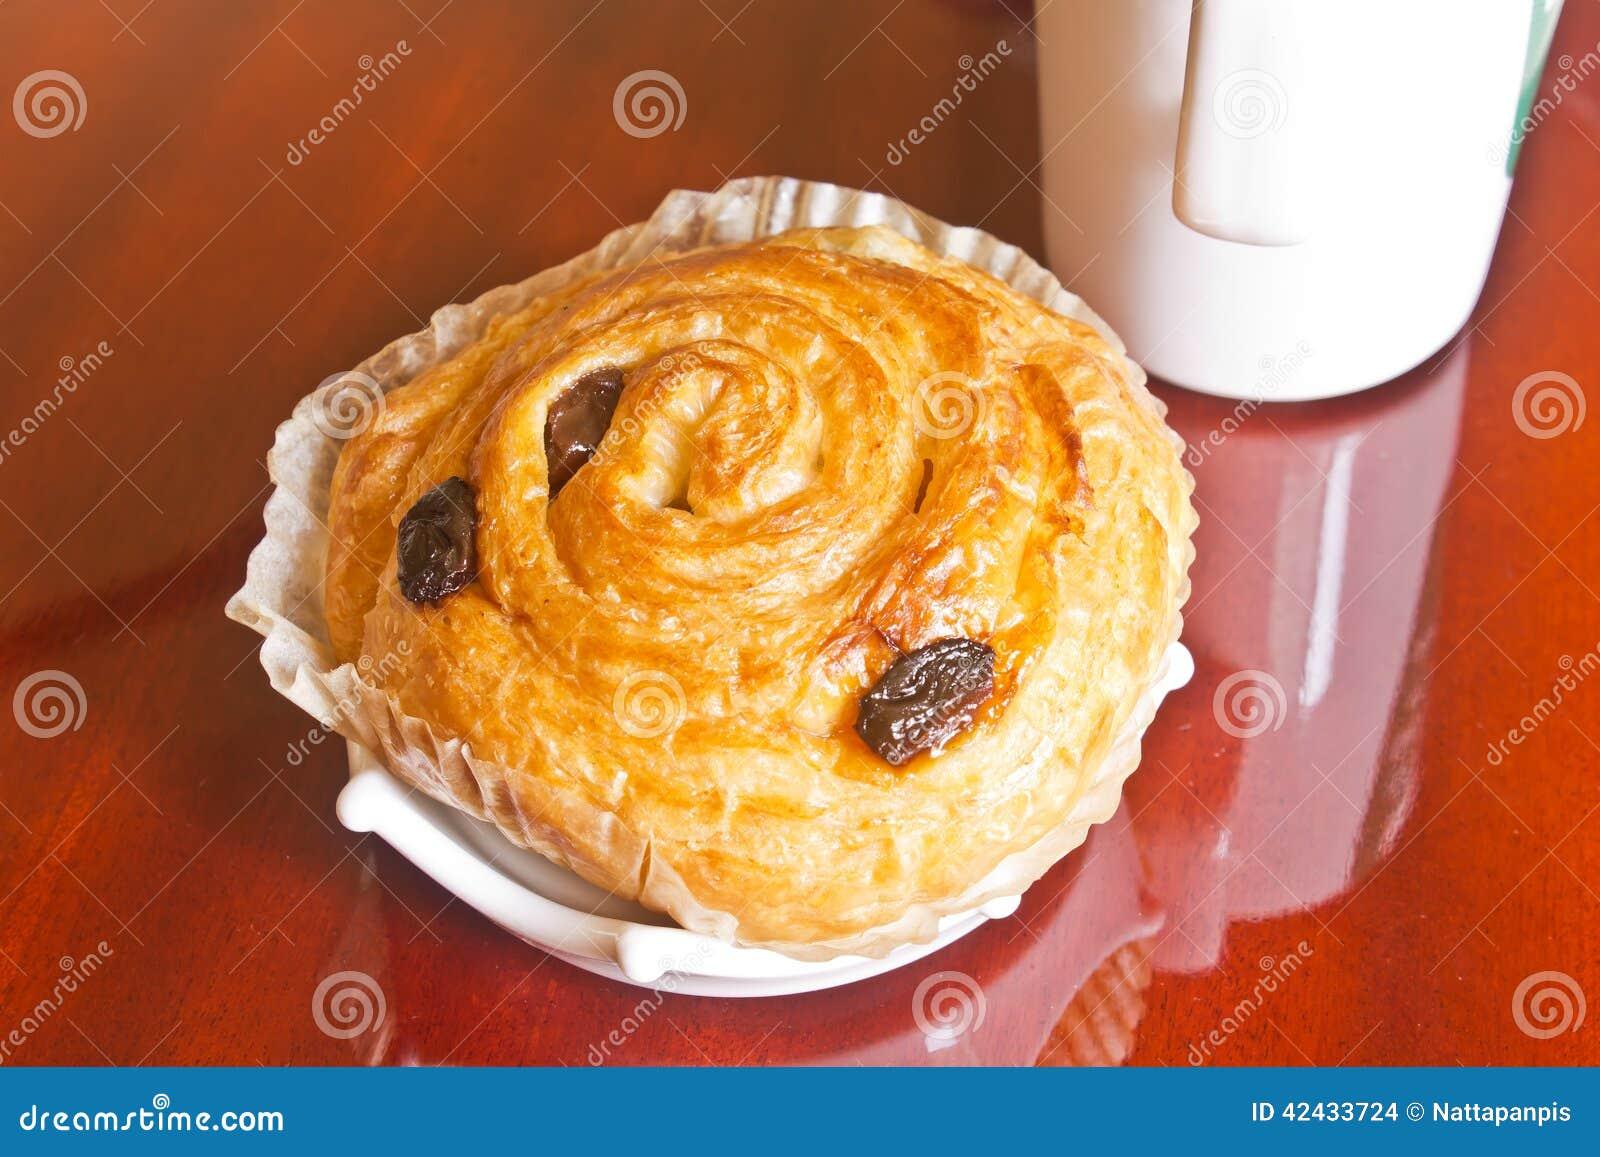 Pan de pasa